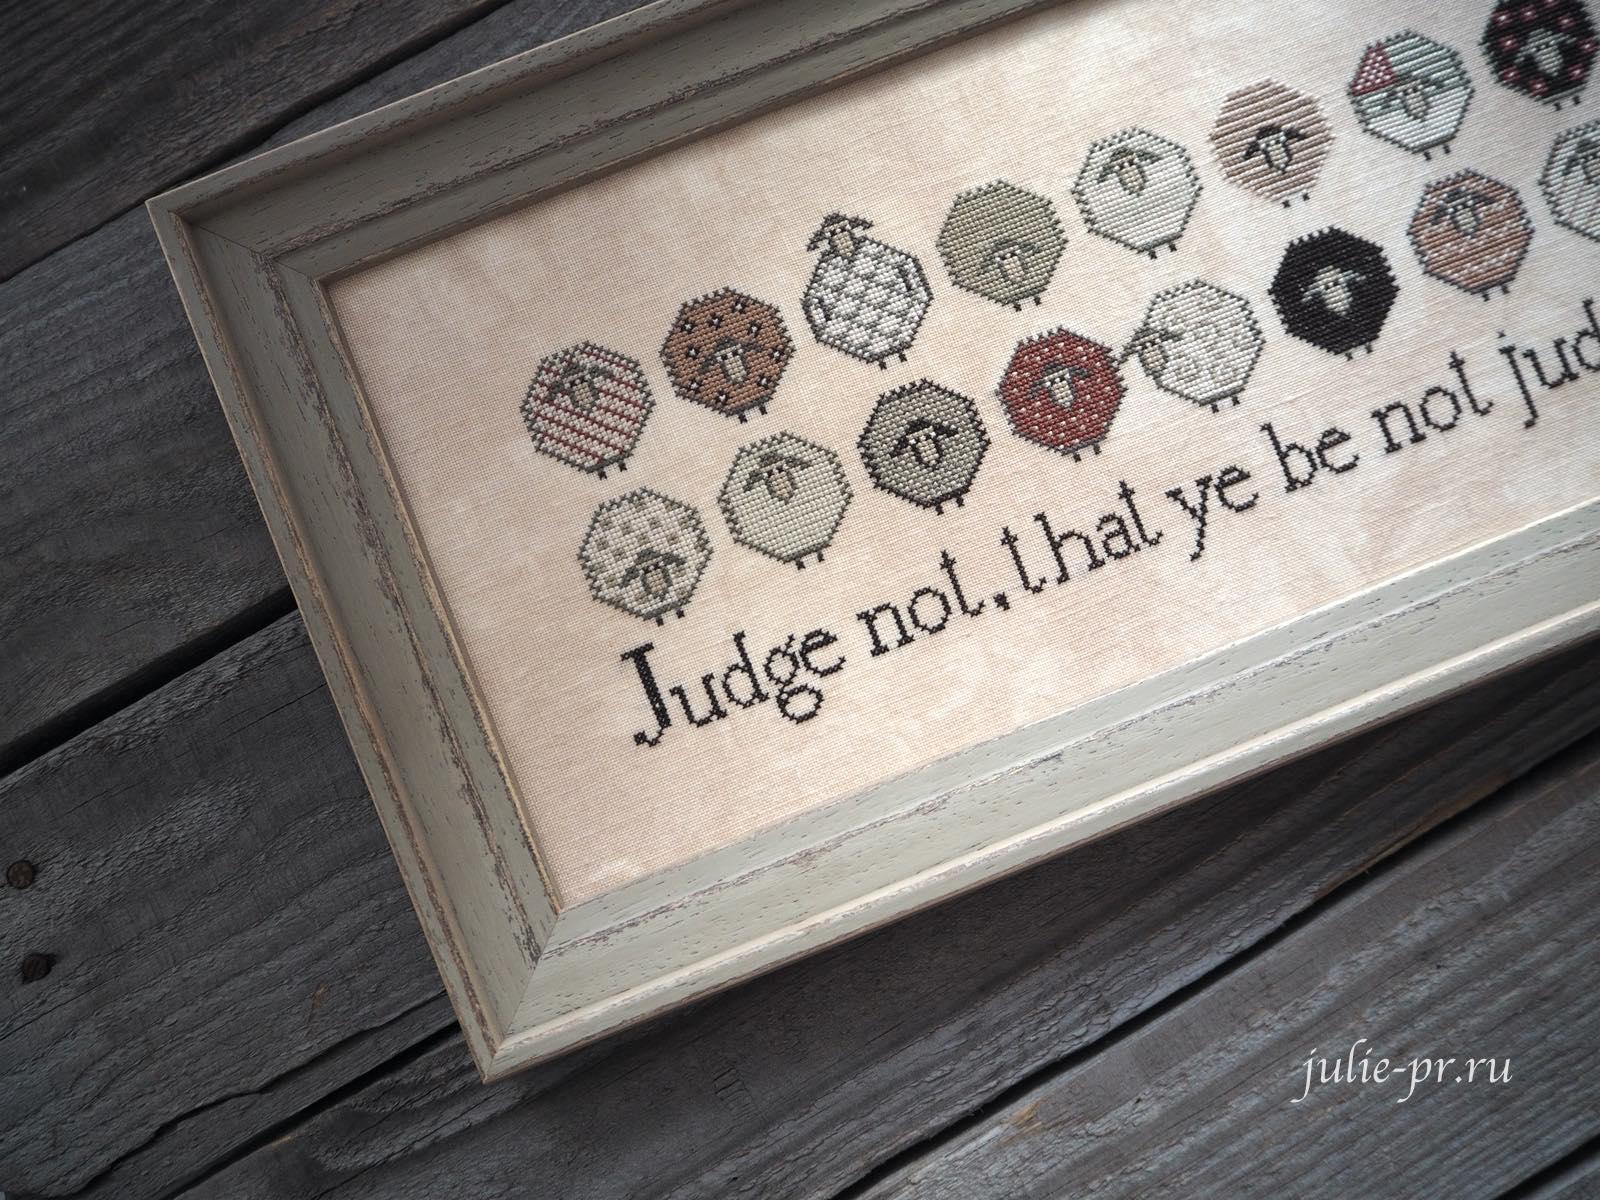 Plum street samplers, Judge not, вышивка крестом, примитив, вышивка на льне